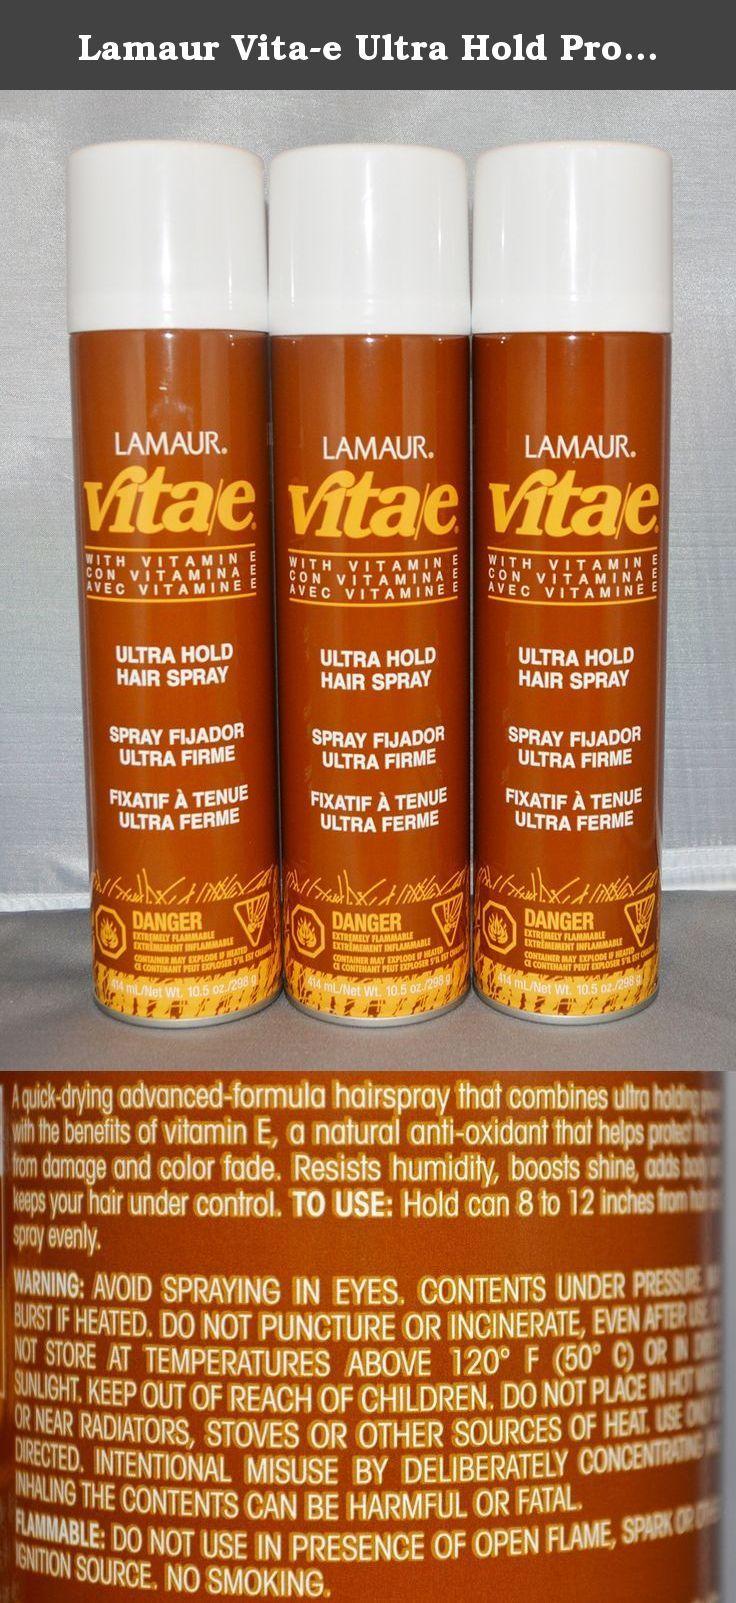 Lamaur Vita E Ultra Hold Professional Hair Spray 80 Voc 10 5 Oz 3 Pack A Quick Drying Advanced Formula Hairspray Benefits Of Vitamin E Color Safe Vitamin E